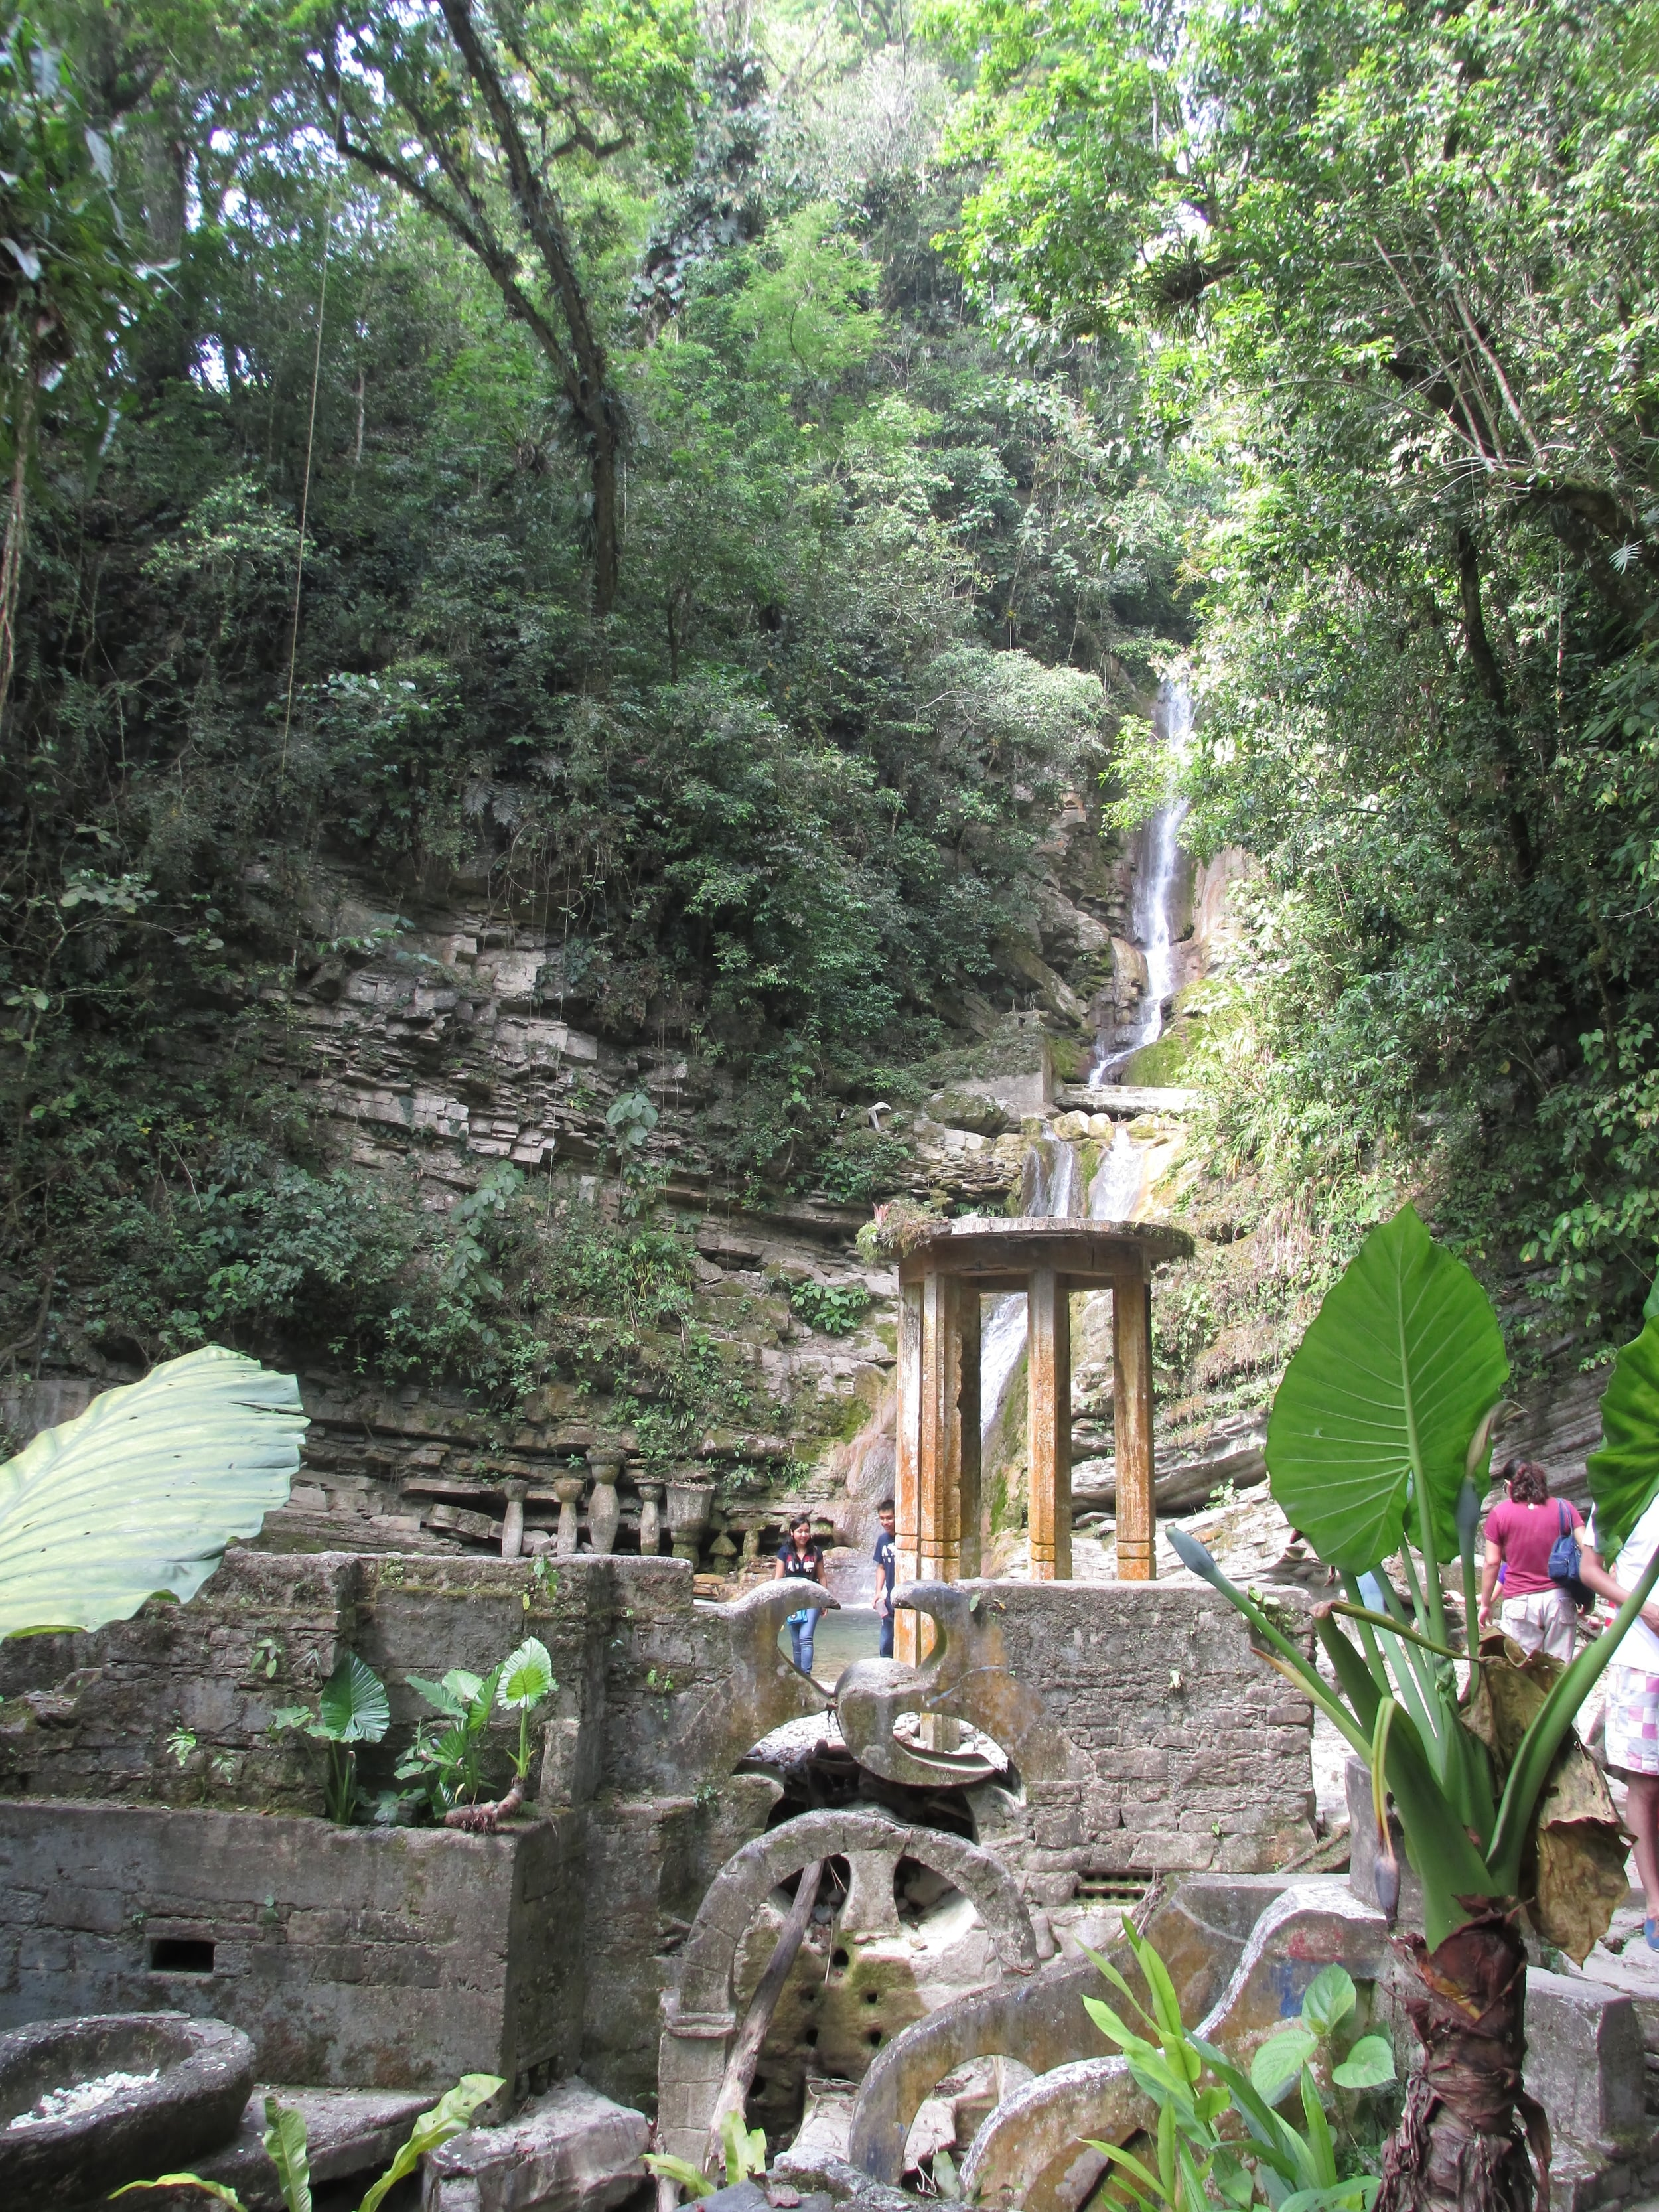 Waterfalls cascade down around the works.